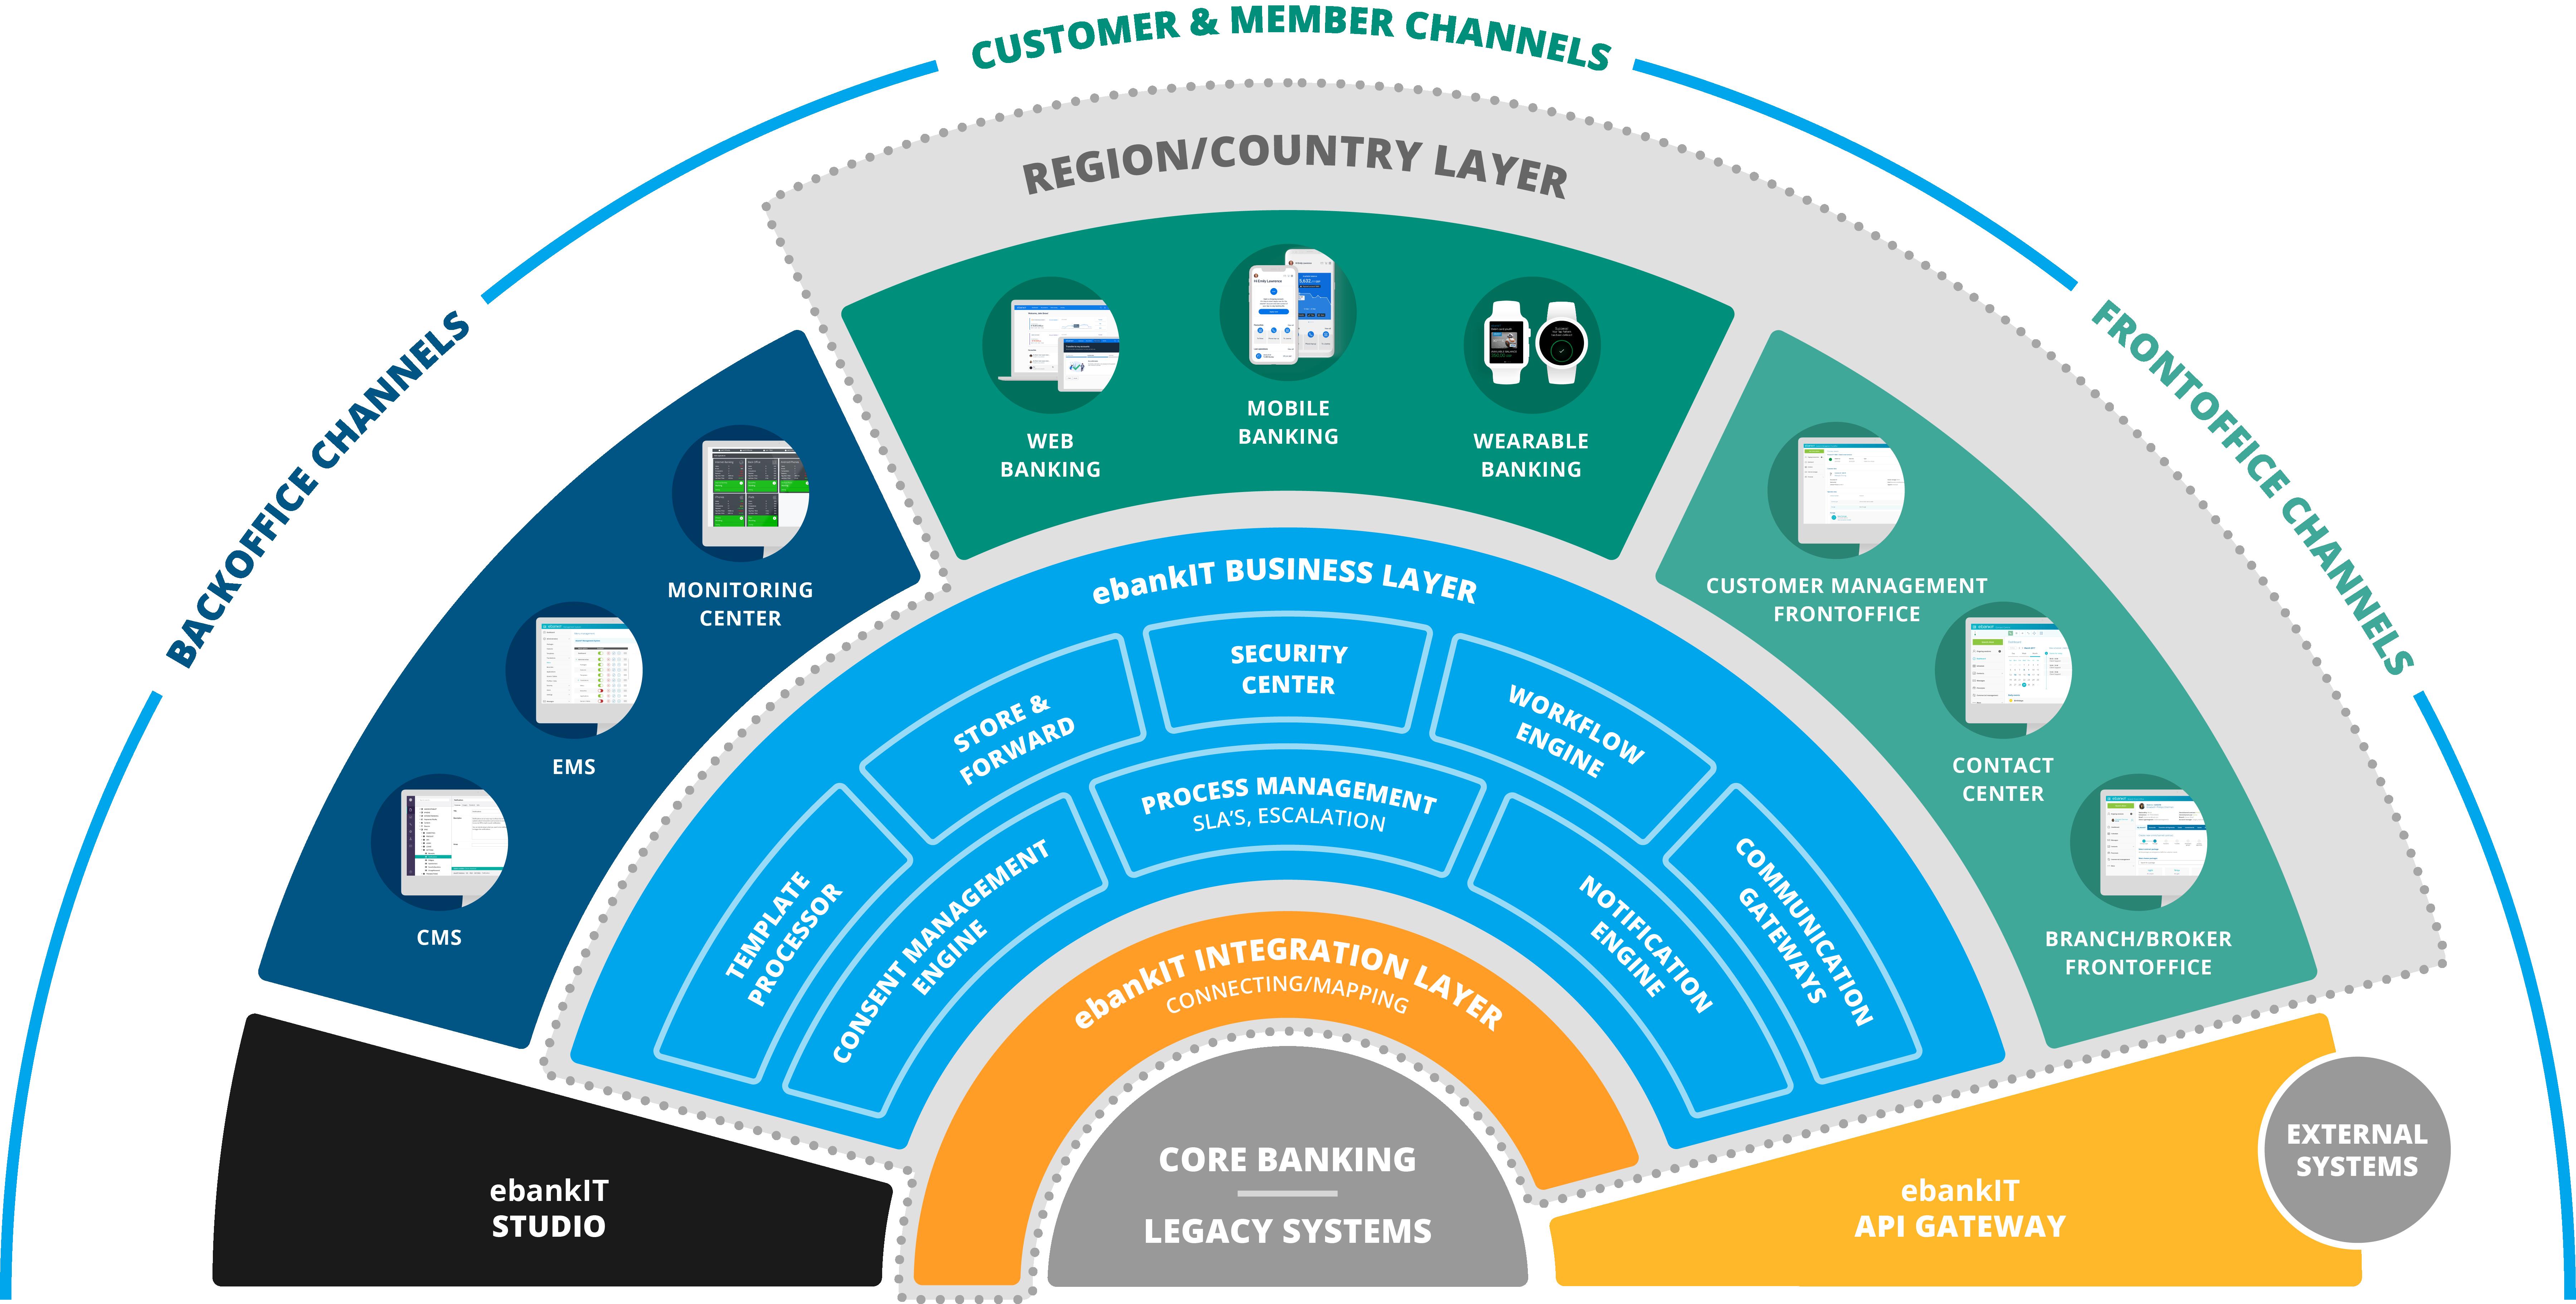 ebankit_platform_region_countrylayer_final_2021